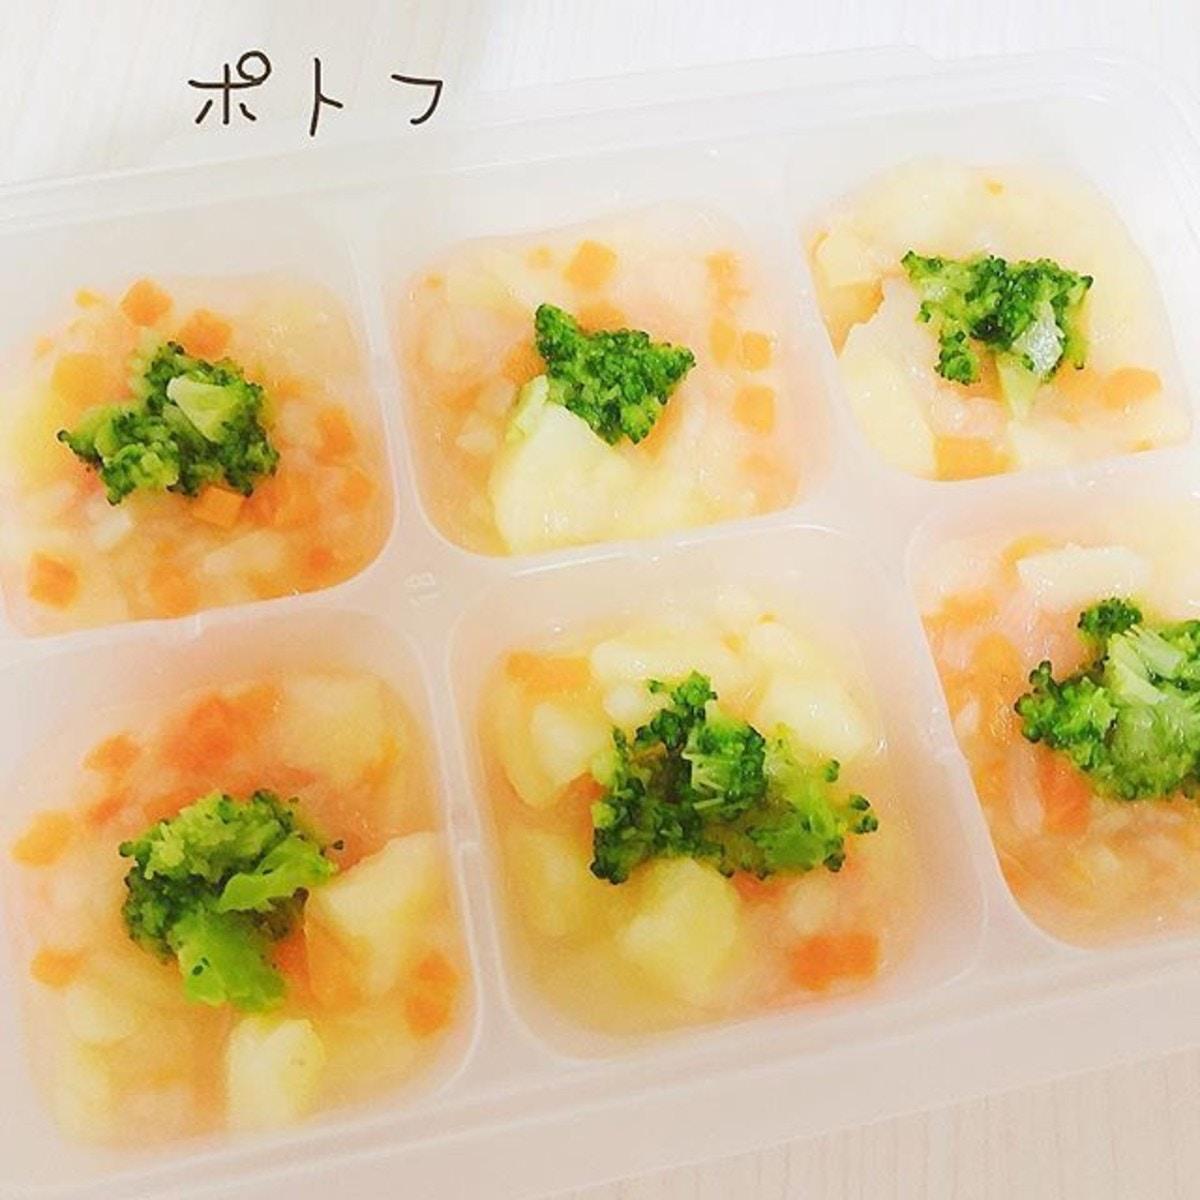 arisaさんの作り置き離乳食がすごい!簡単レシピを紹介(離乳食